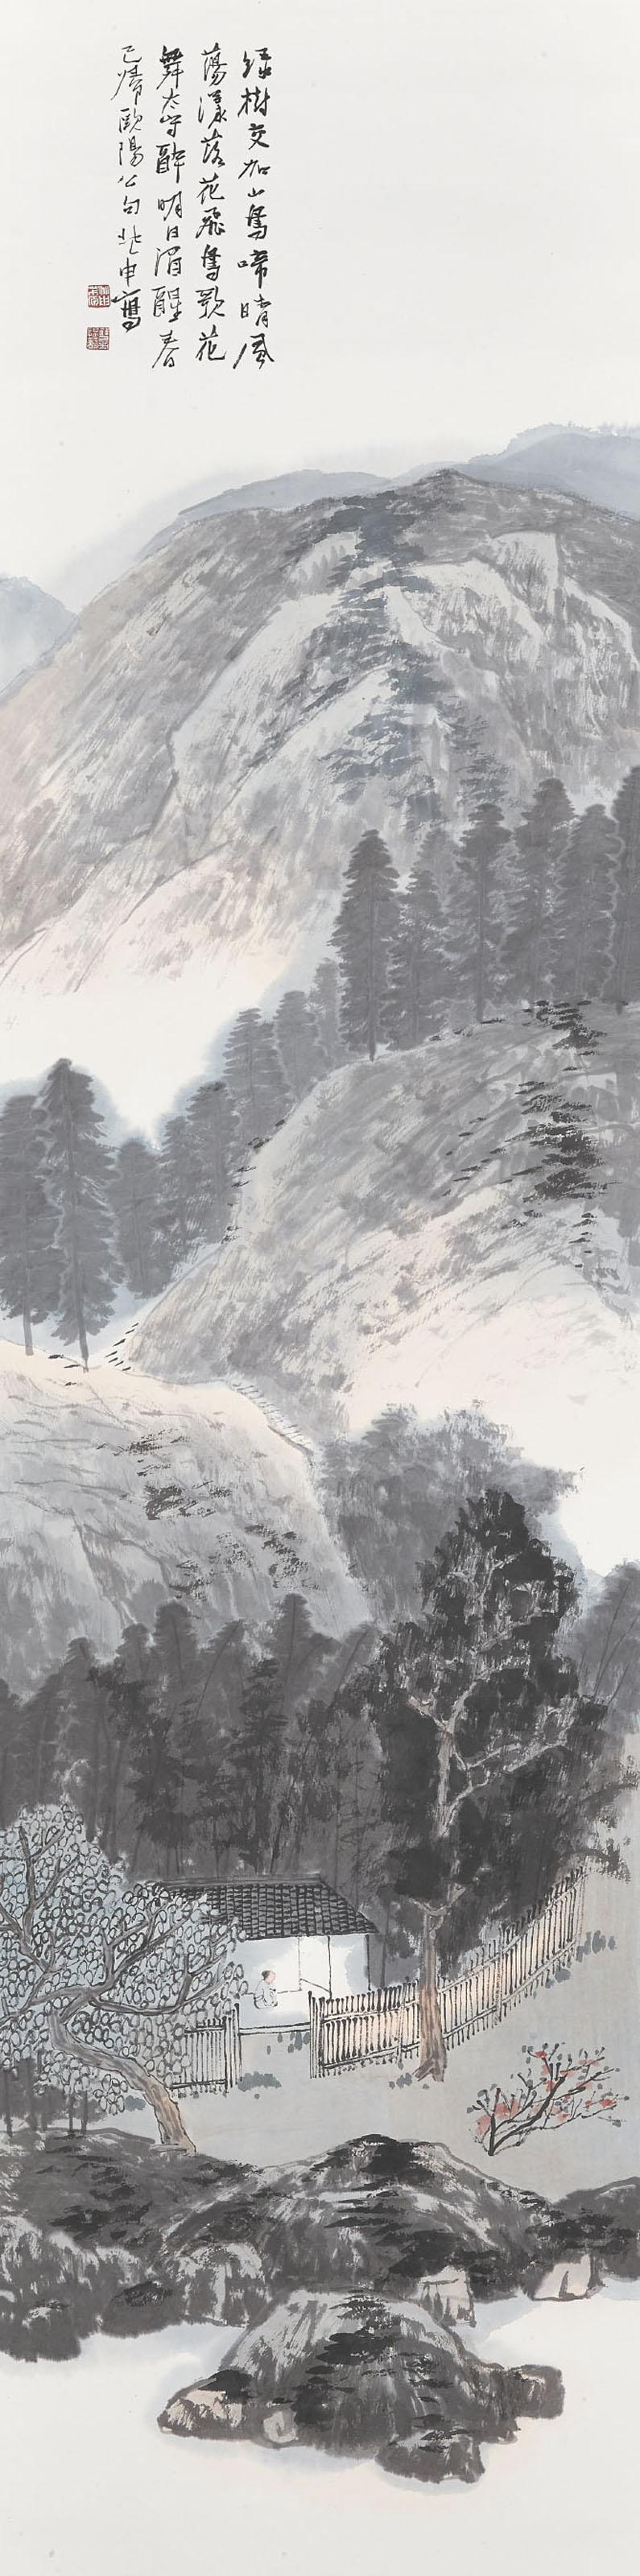 Scenery of Four Seasons